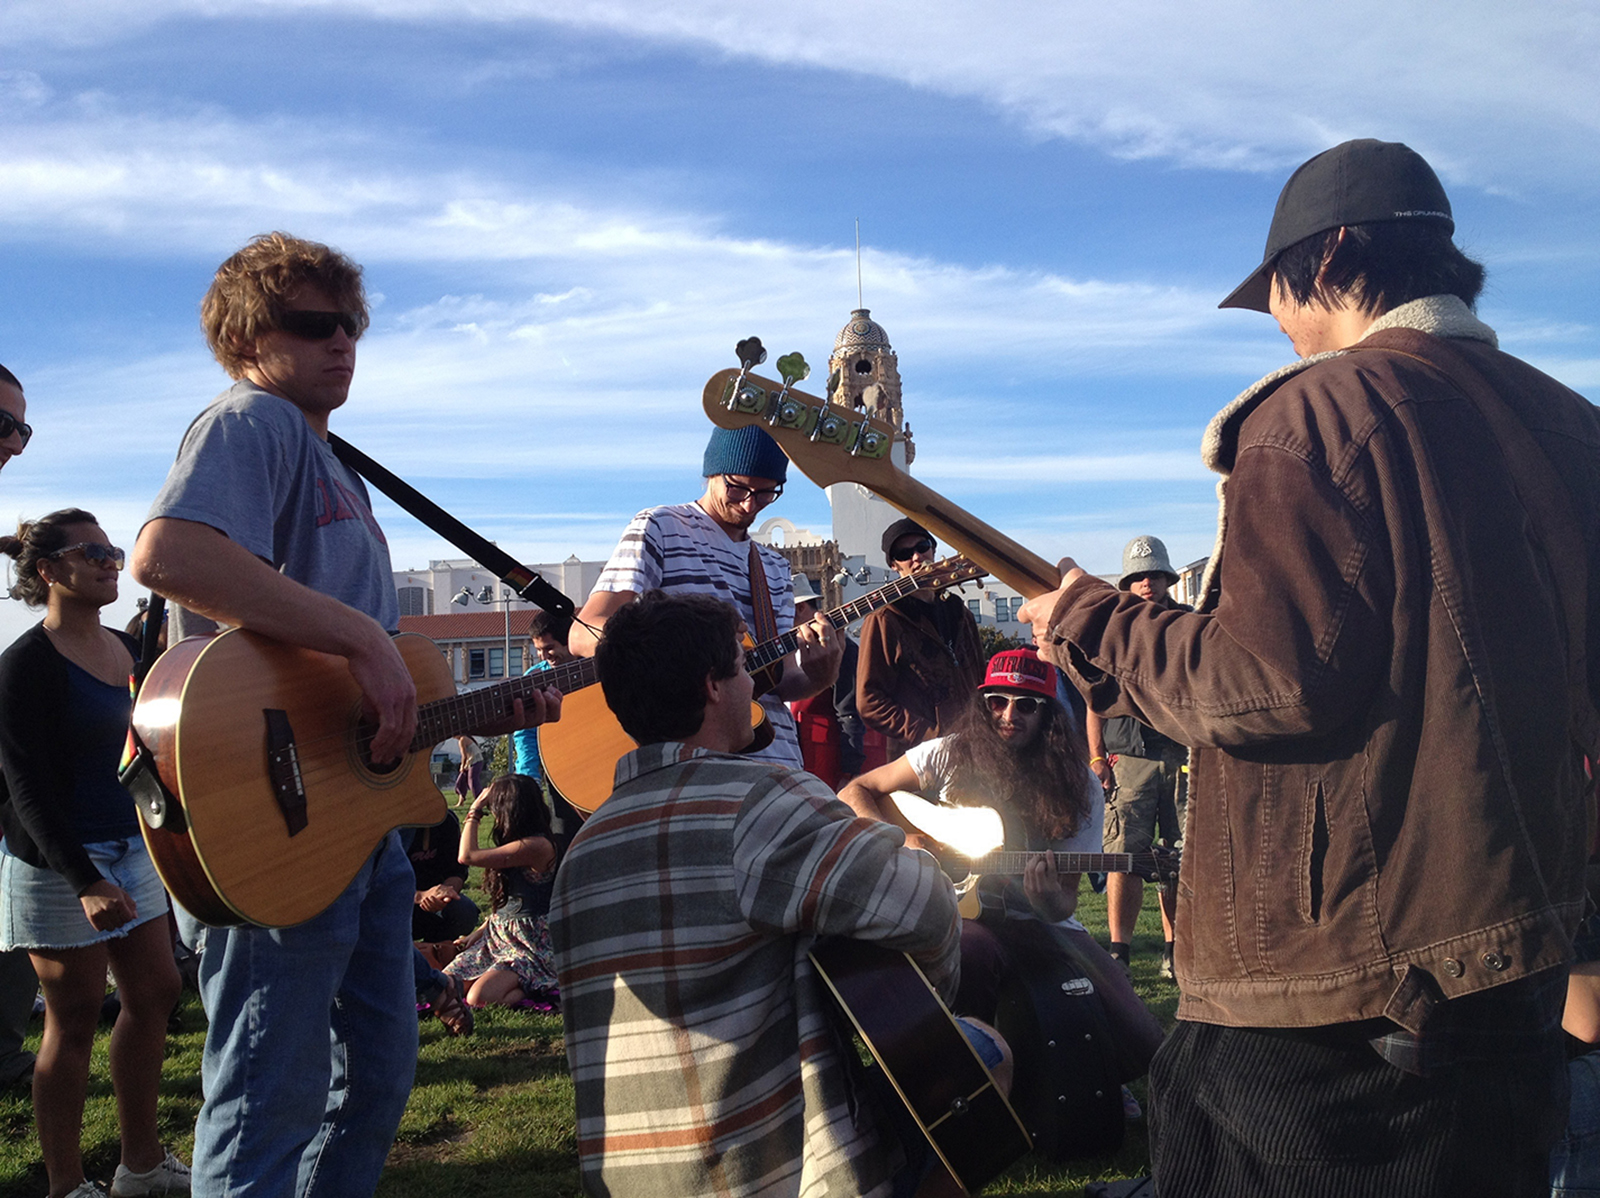 SNAP: Impromptu Jam Session in Dolores Park